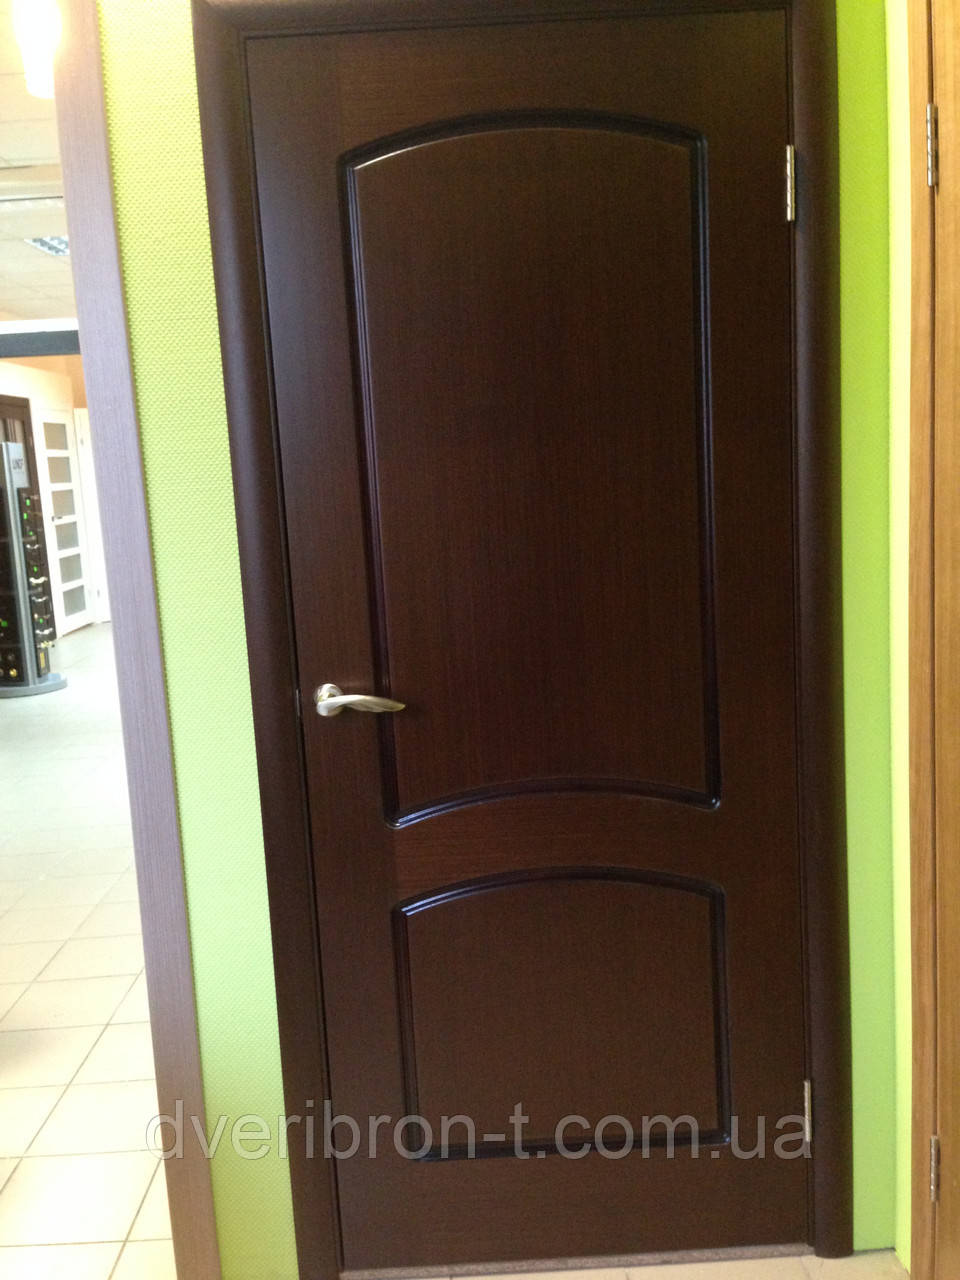 Двери Белоруссии Наполеон ПГ венге модерн:полотно 8 прав. +короб+ наличники на 1 стор.+защелка+петли